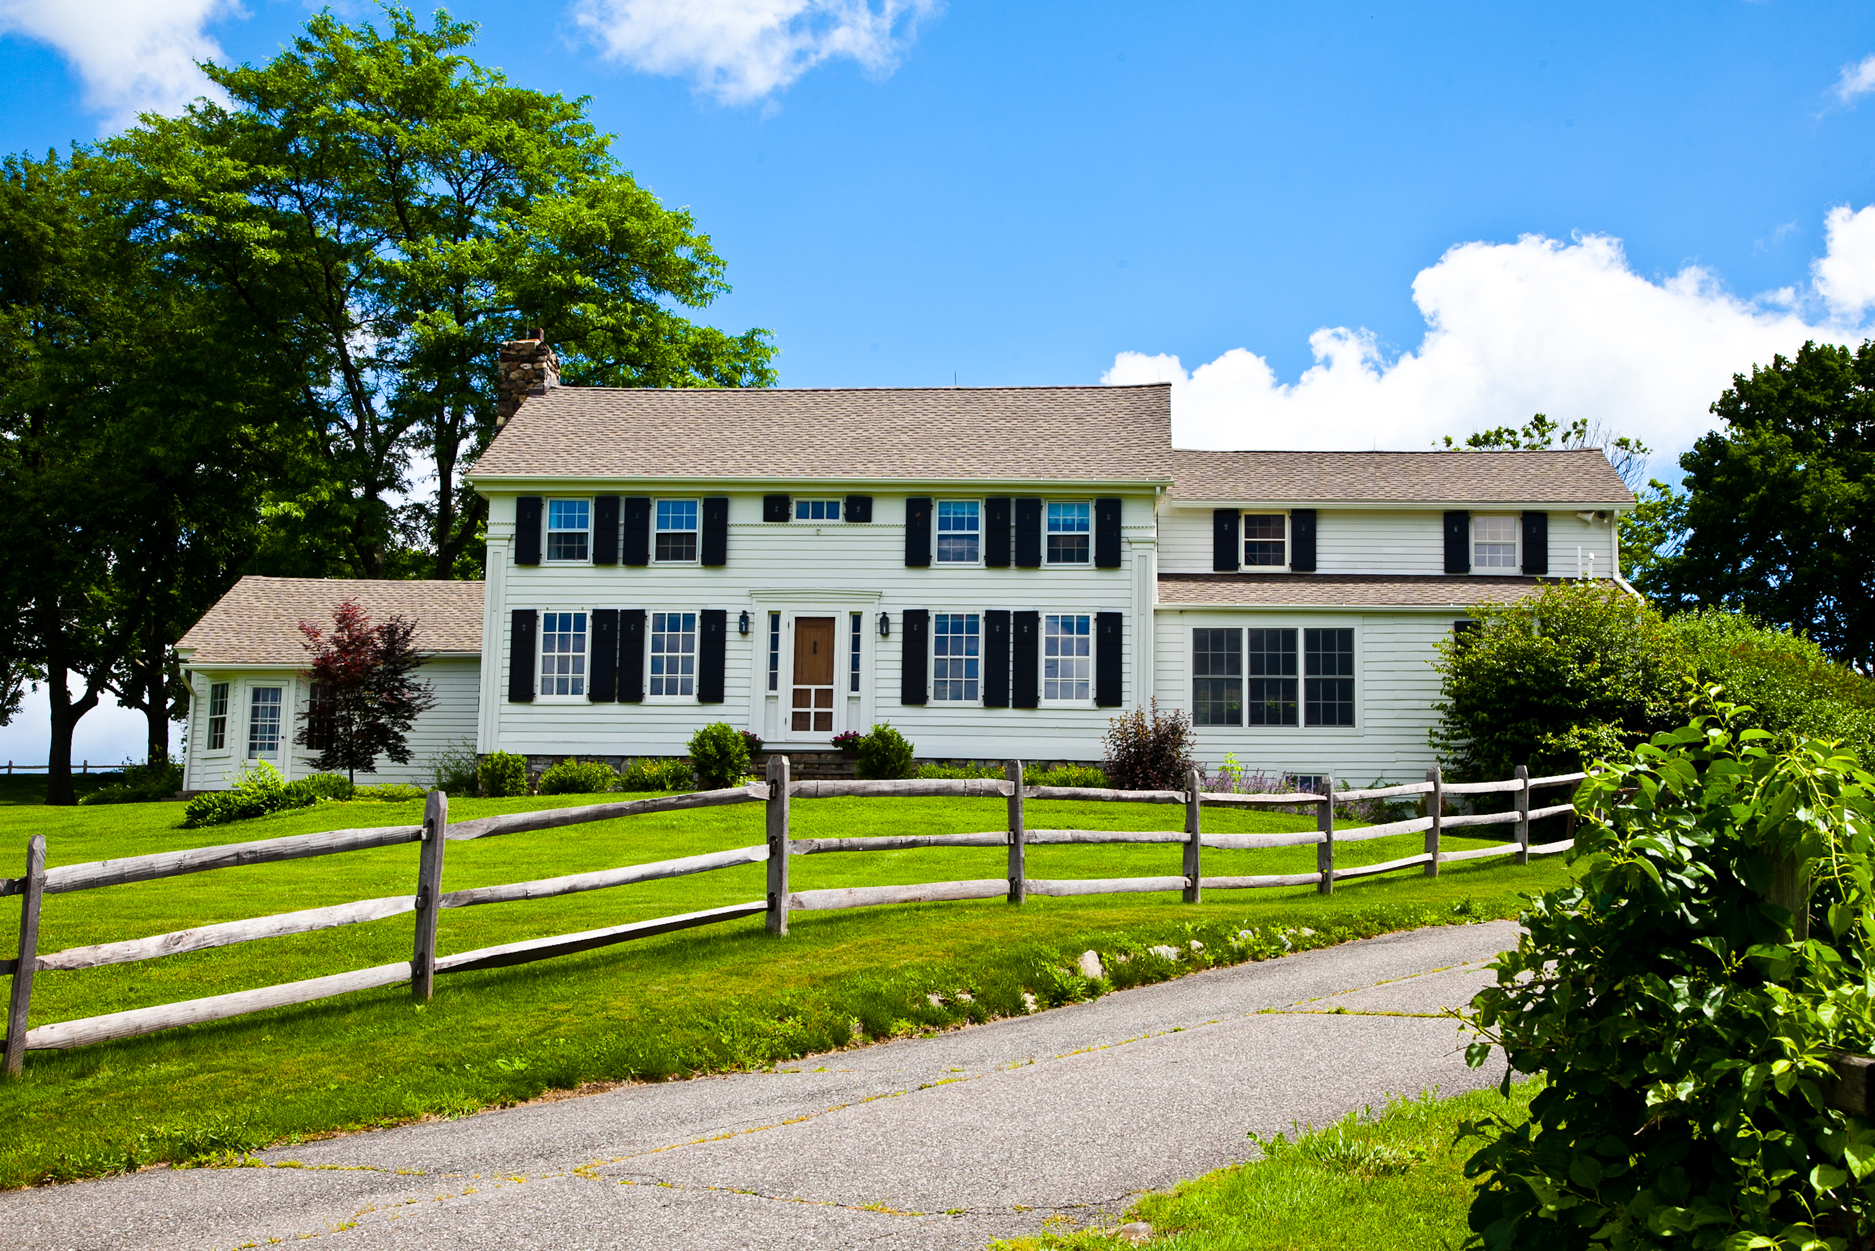 独户住宅 为 销售 在 Red Fox Farm 181 Beebe Hill Road Falls Village, 康涅狄格州, 06031 美国